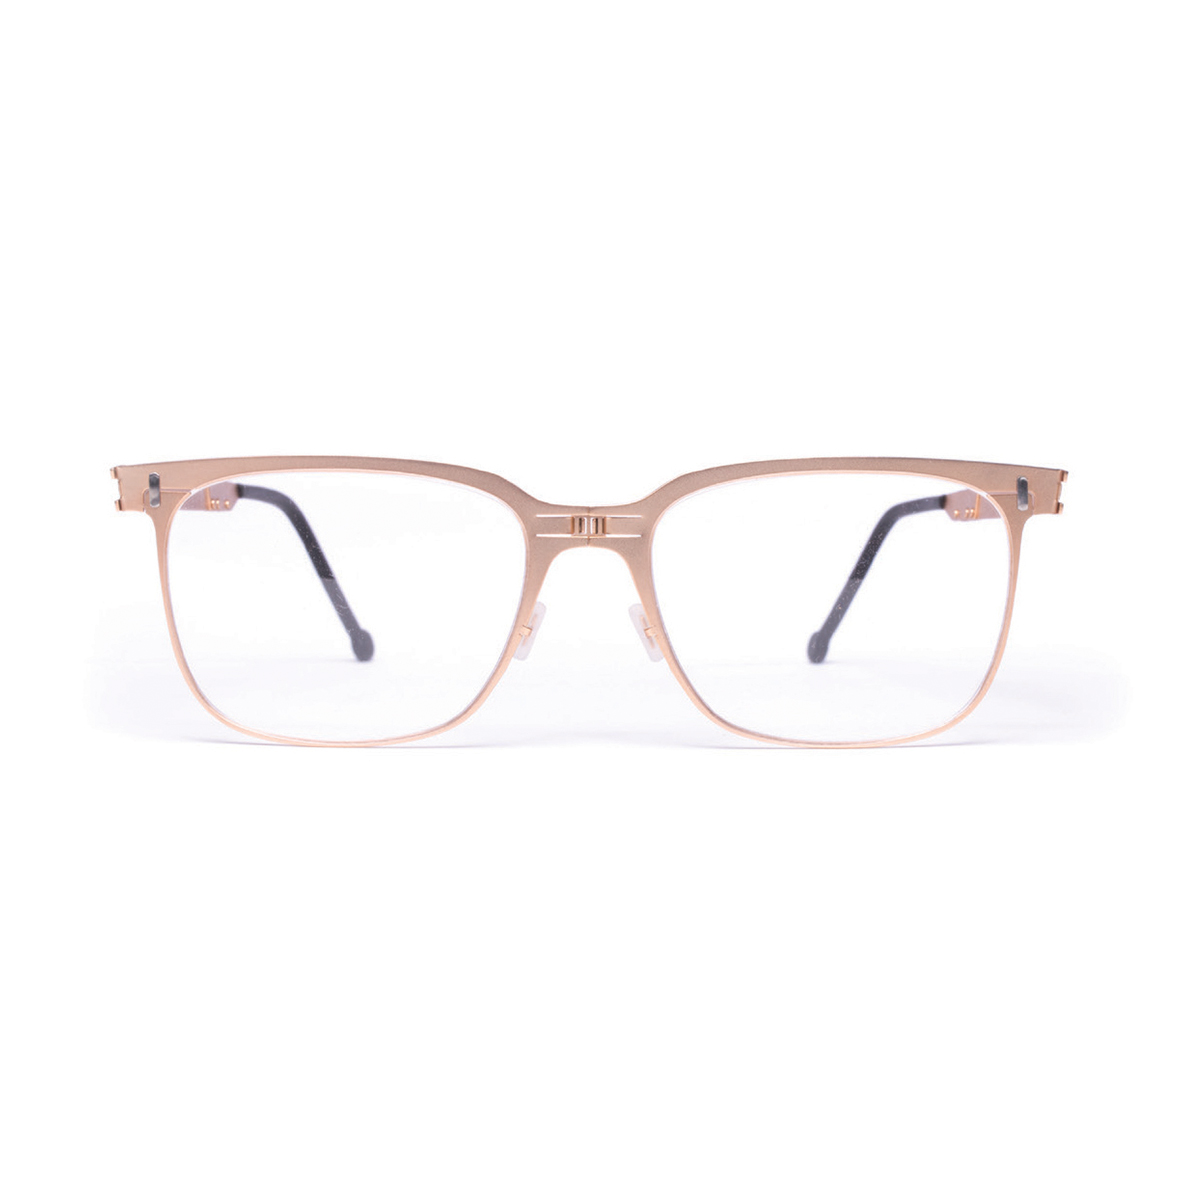 ROAV Vision Ophthalmic Frames